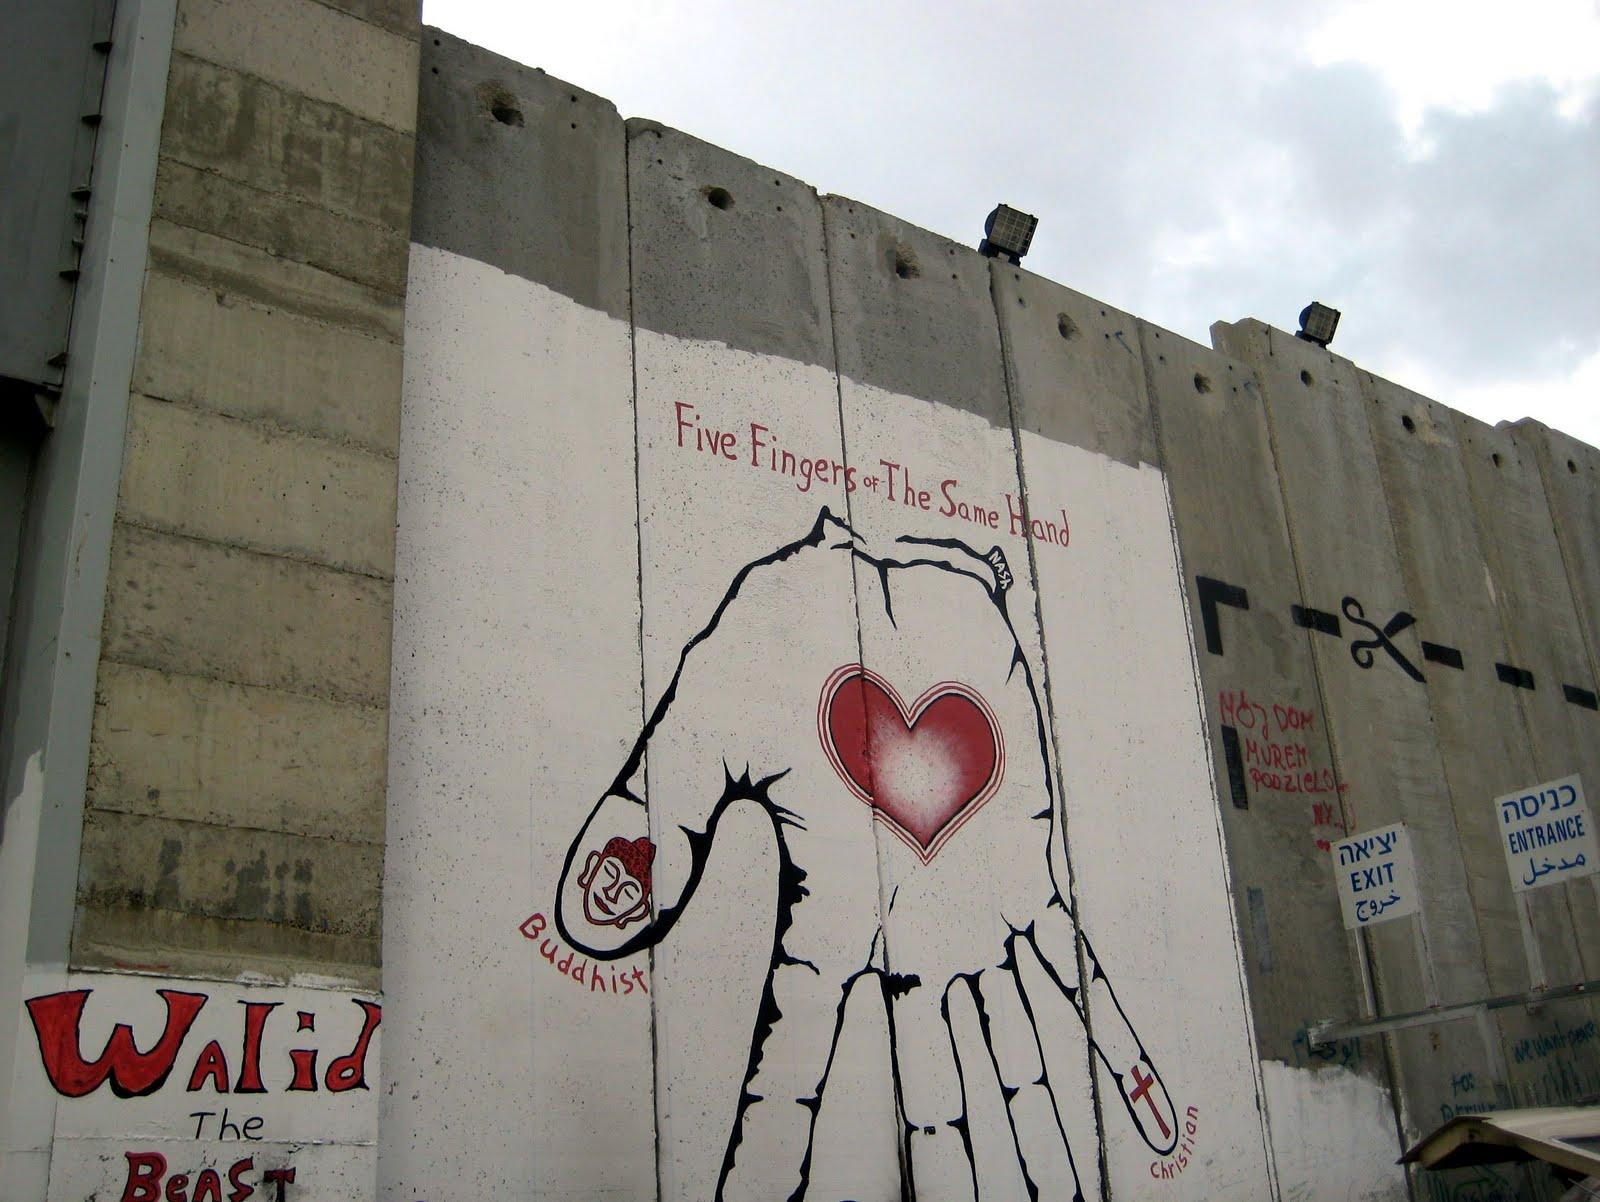 Wall dividing Israel and Palestine